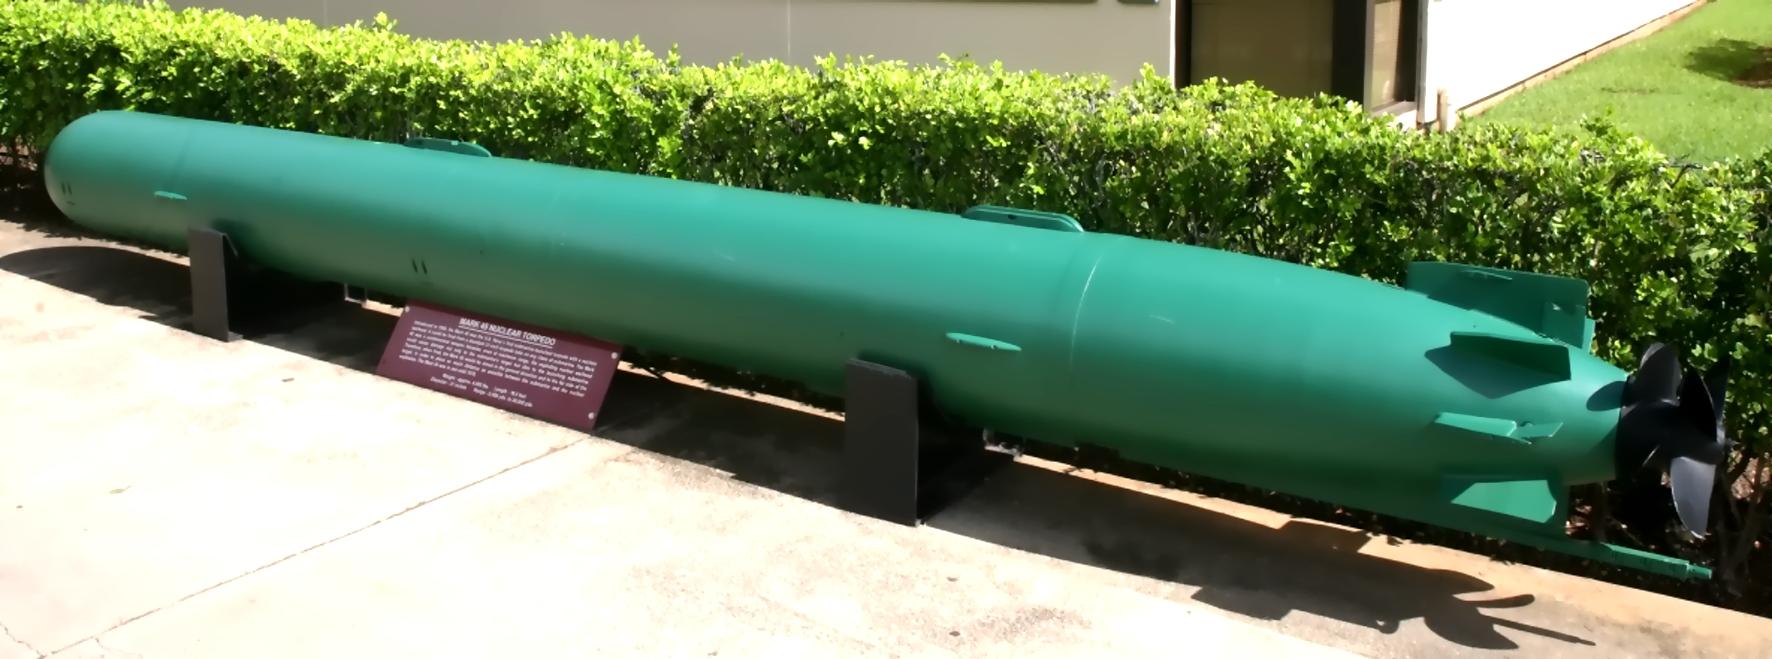 image-28-a-mark-45-torpedo.jpg